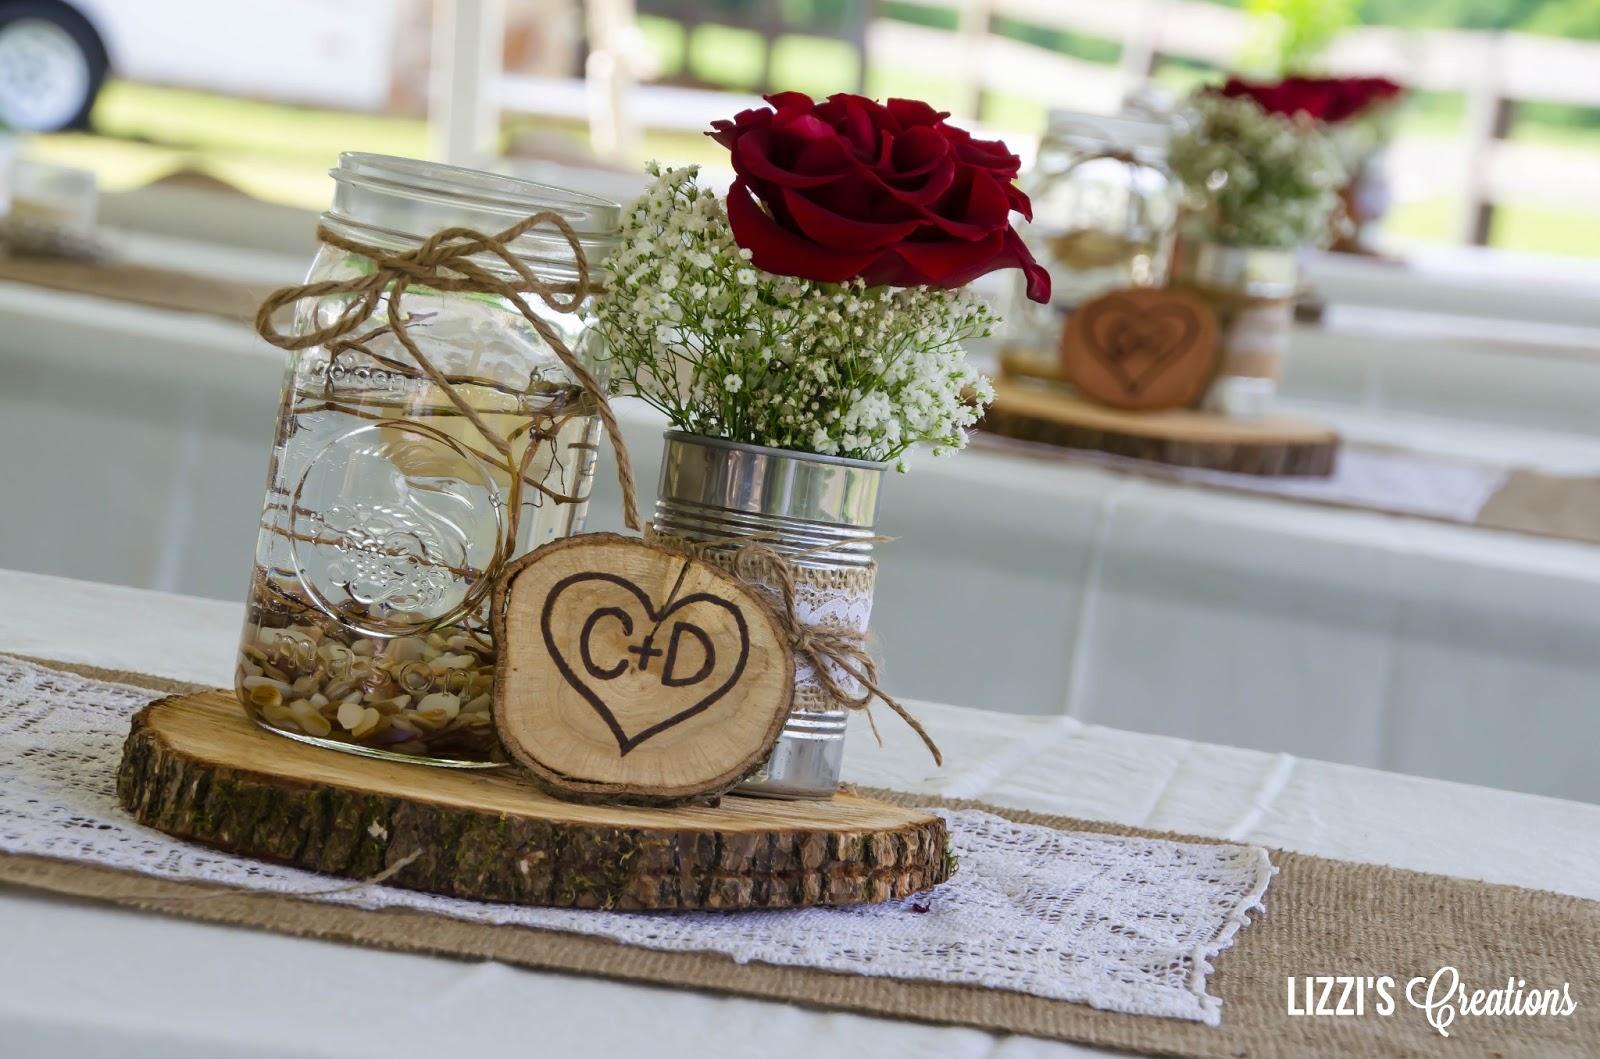 Wedding Ideas Using Mason Jars: Lizzi's Creations: Project Wedding: The Decor